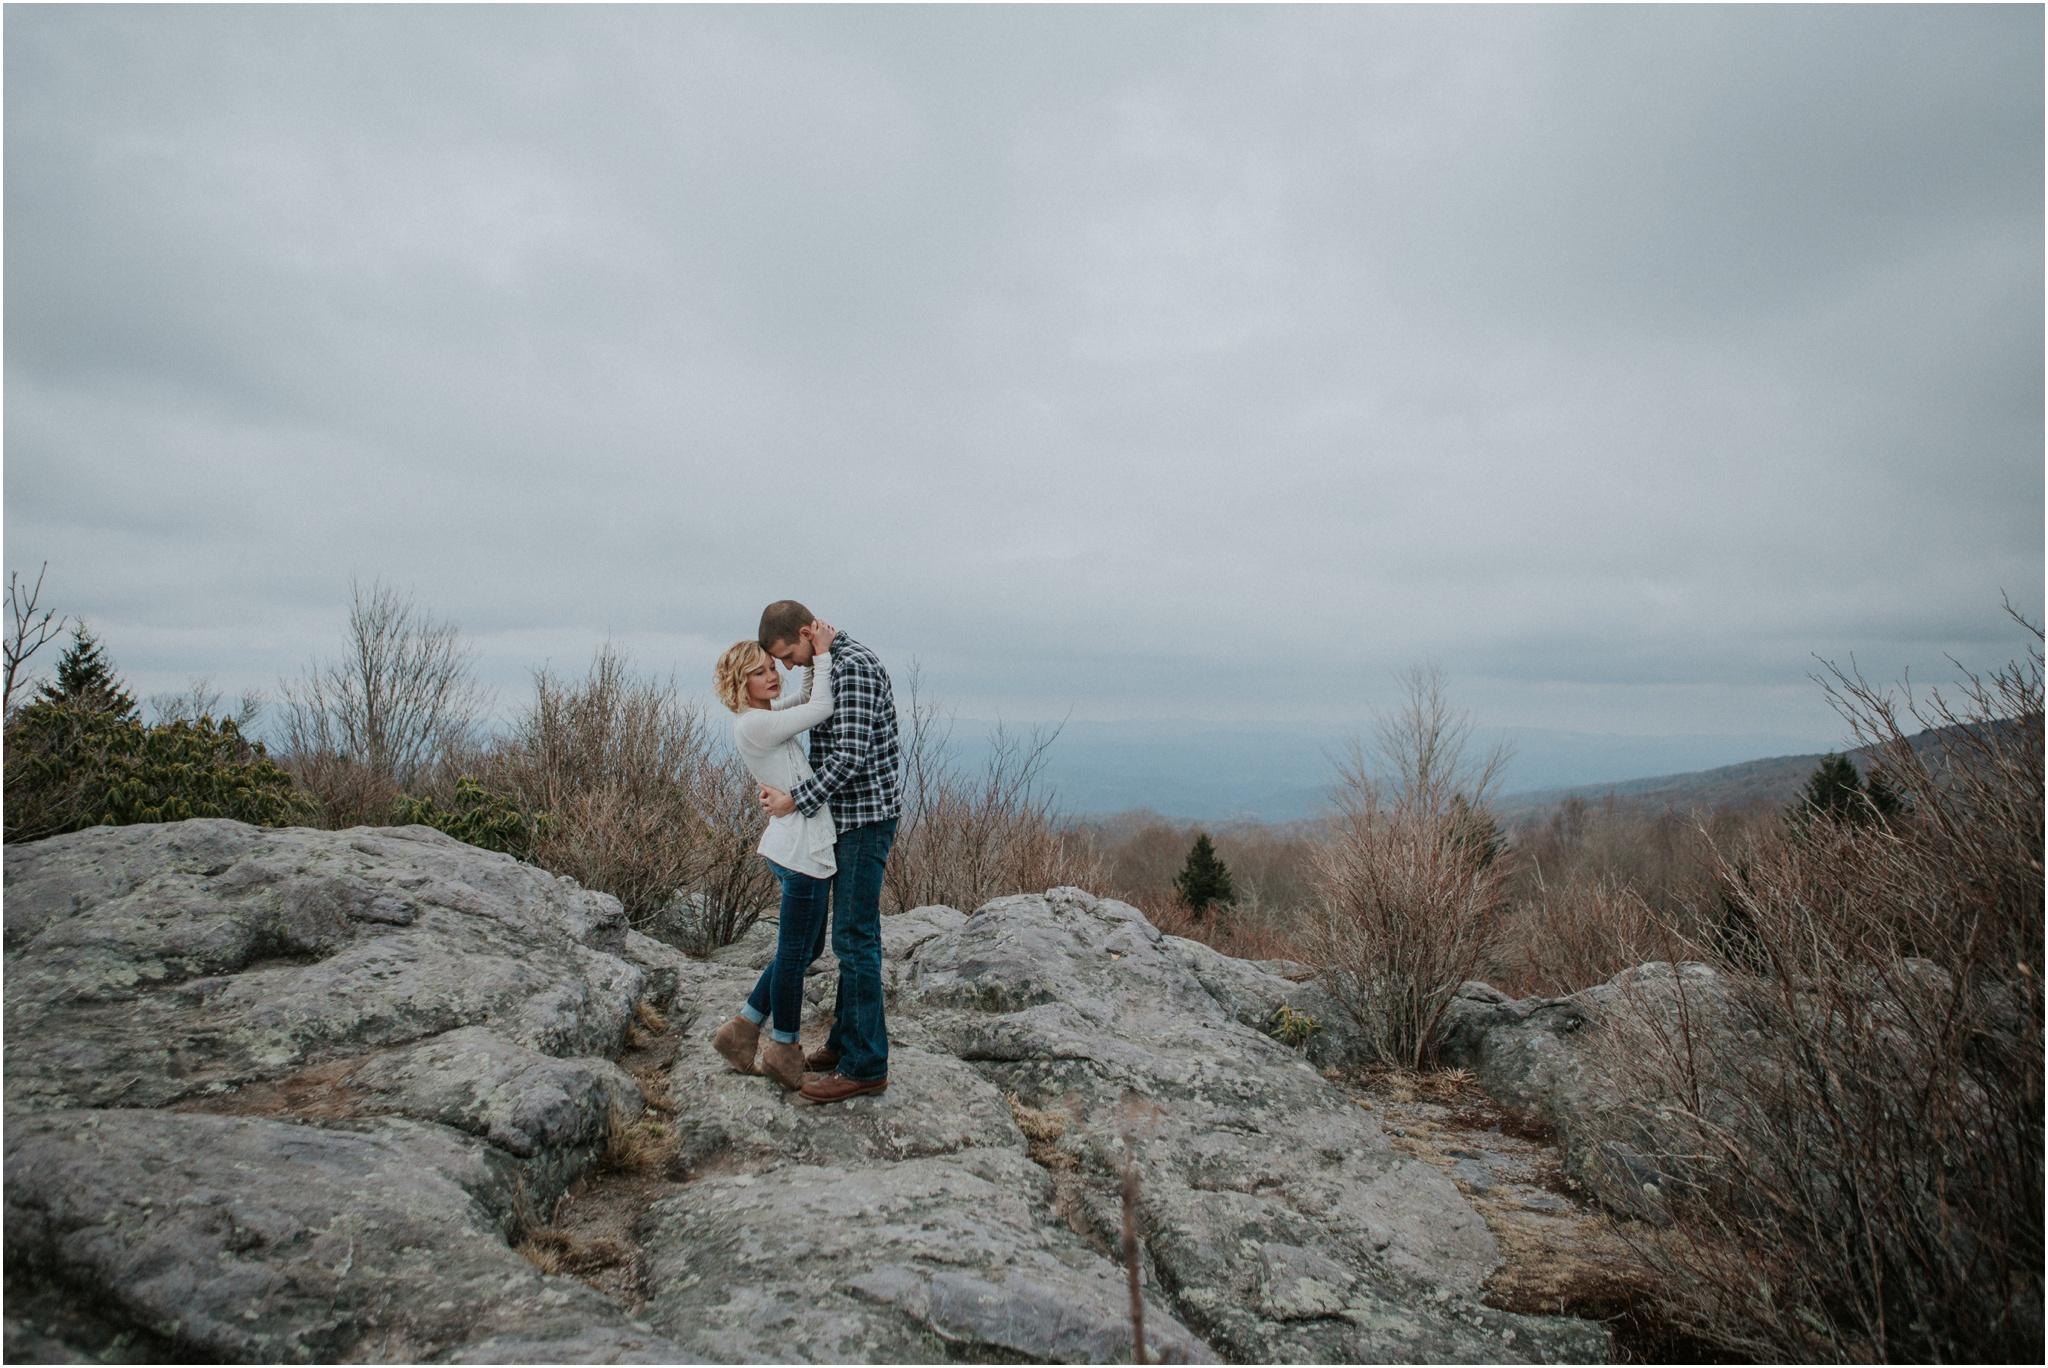 grayson-highlands-engagement-session-foggy-mountain-rustic-appalachian-virginia-katy-sergent-photography_0012.jpg